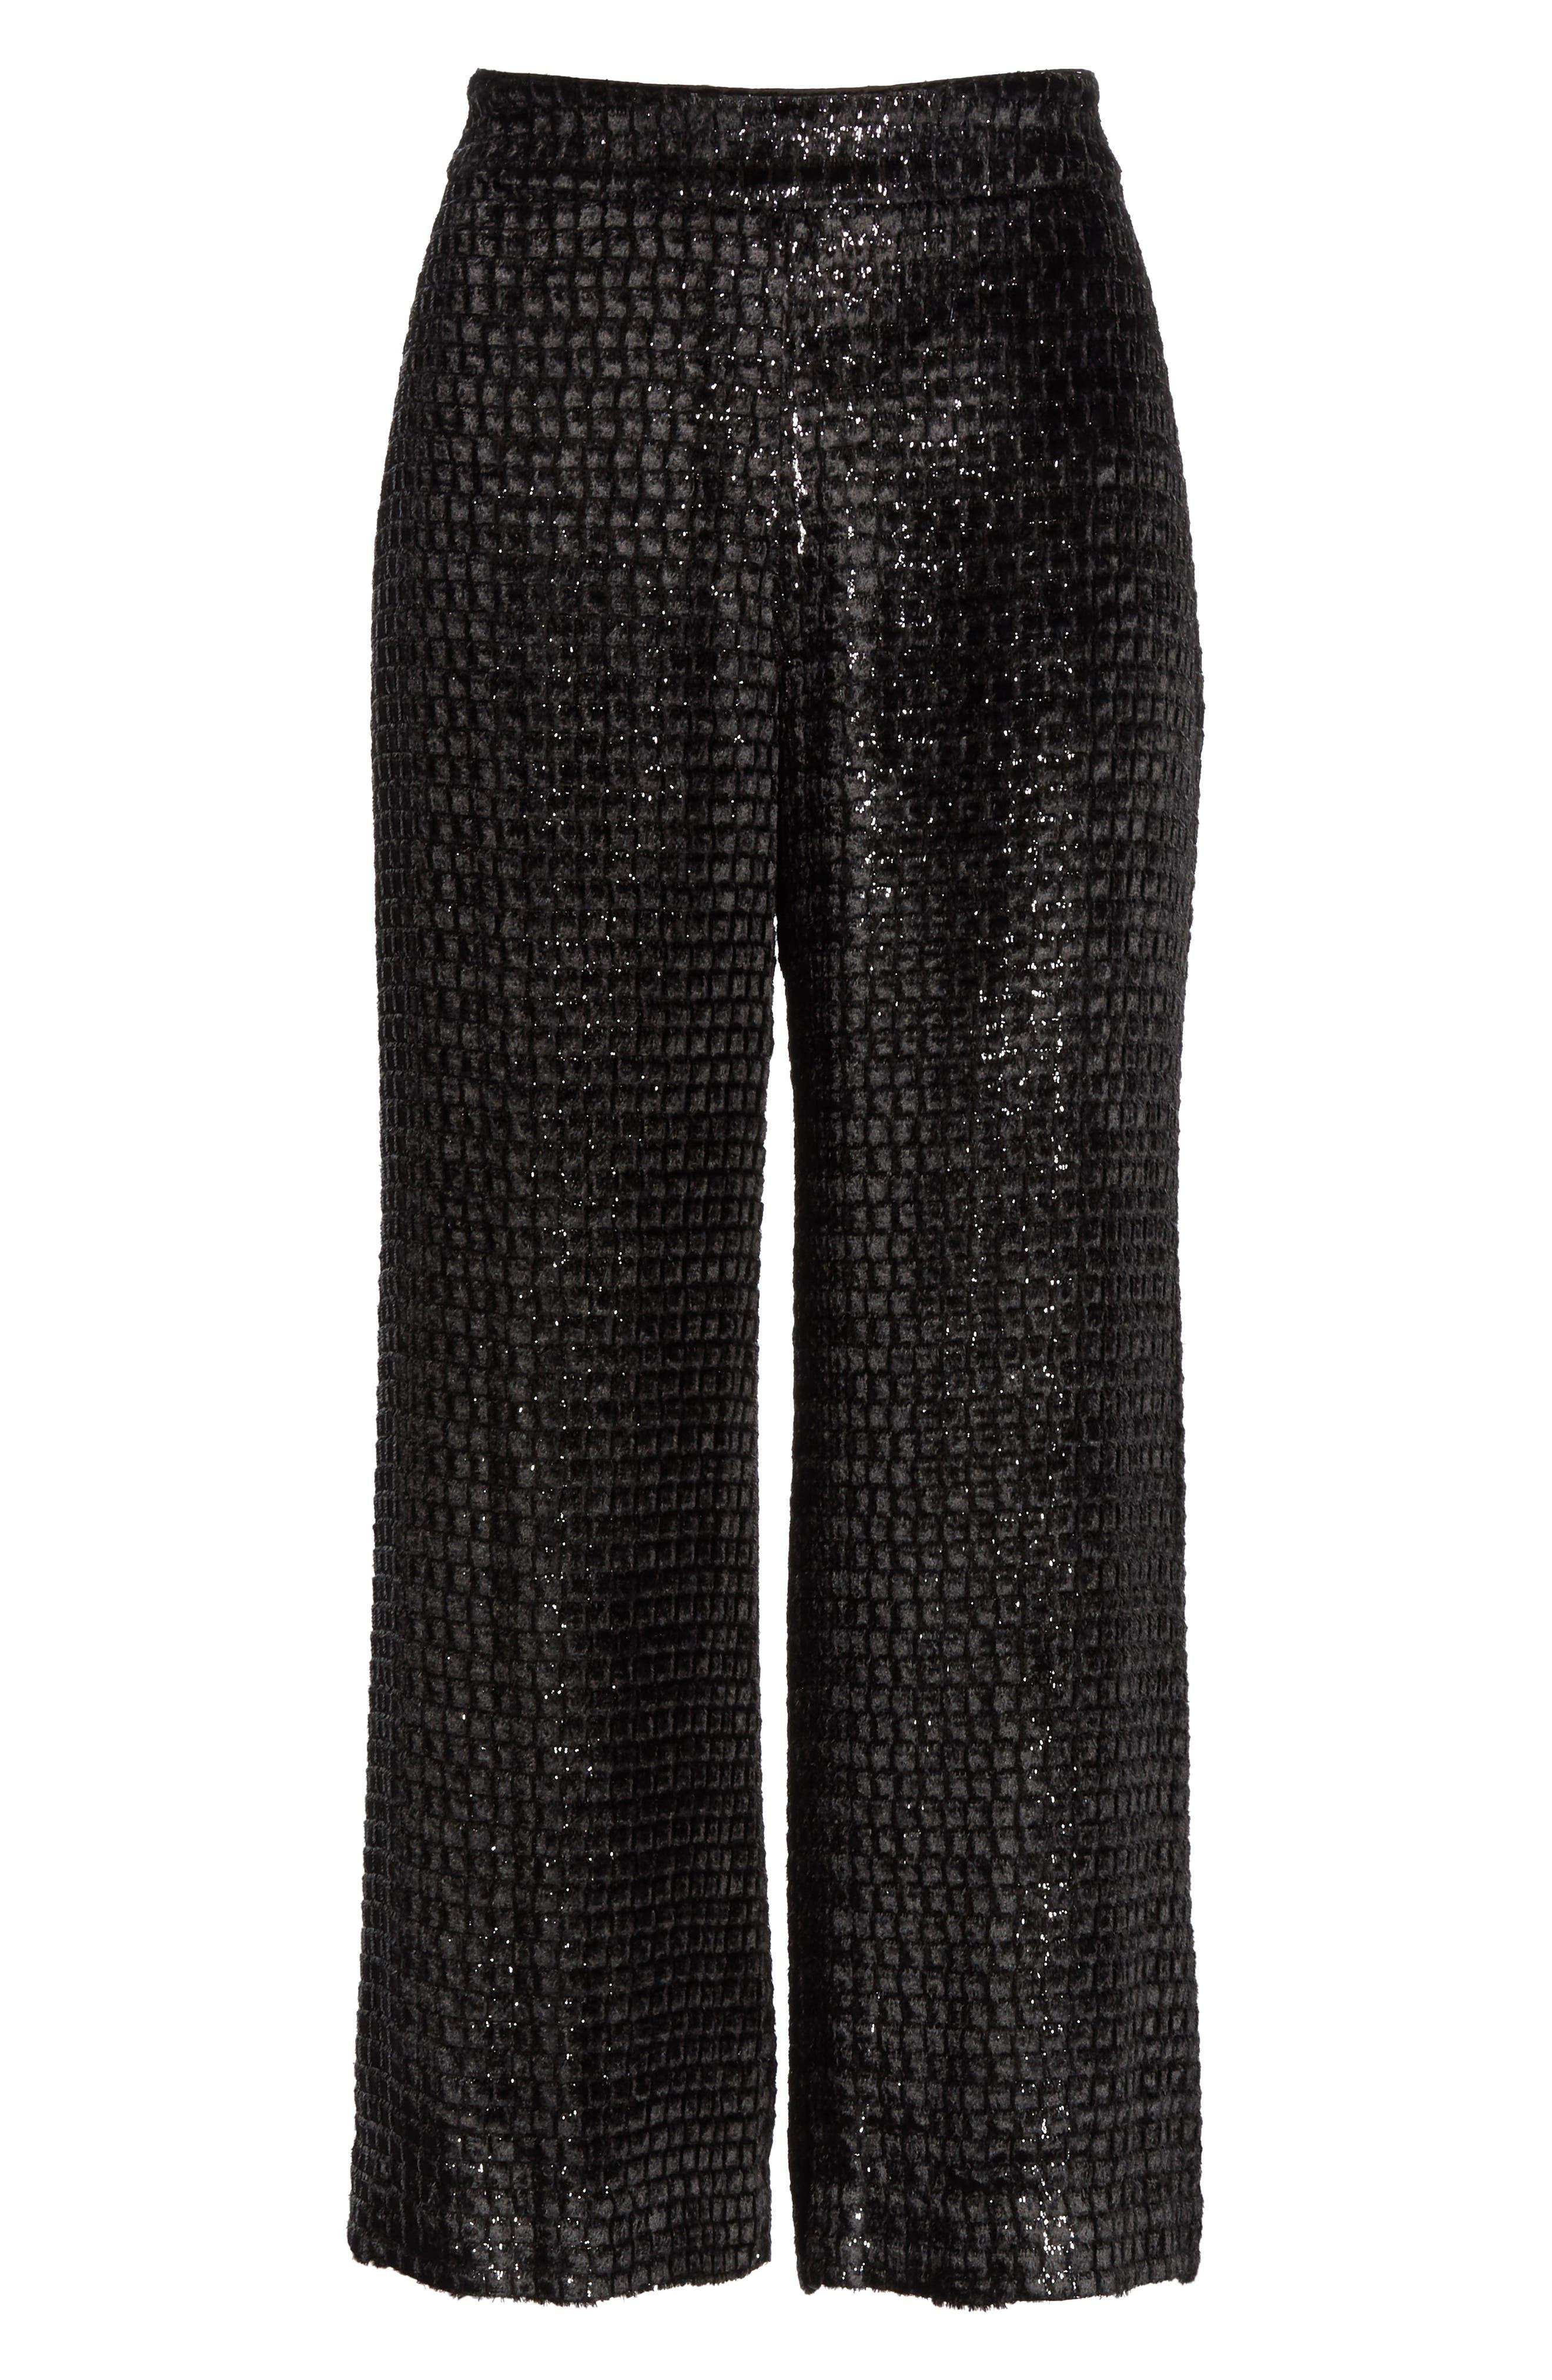 BRANDON MAXWELL, Metallic Velvet Crop Wide Leg Pants, Alternate thumbnail 6, color, BLACK